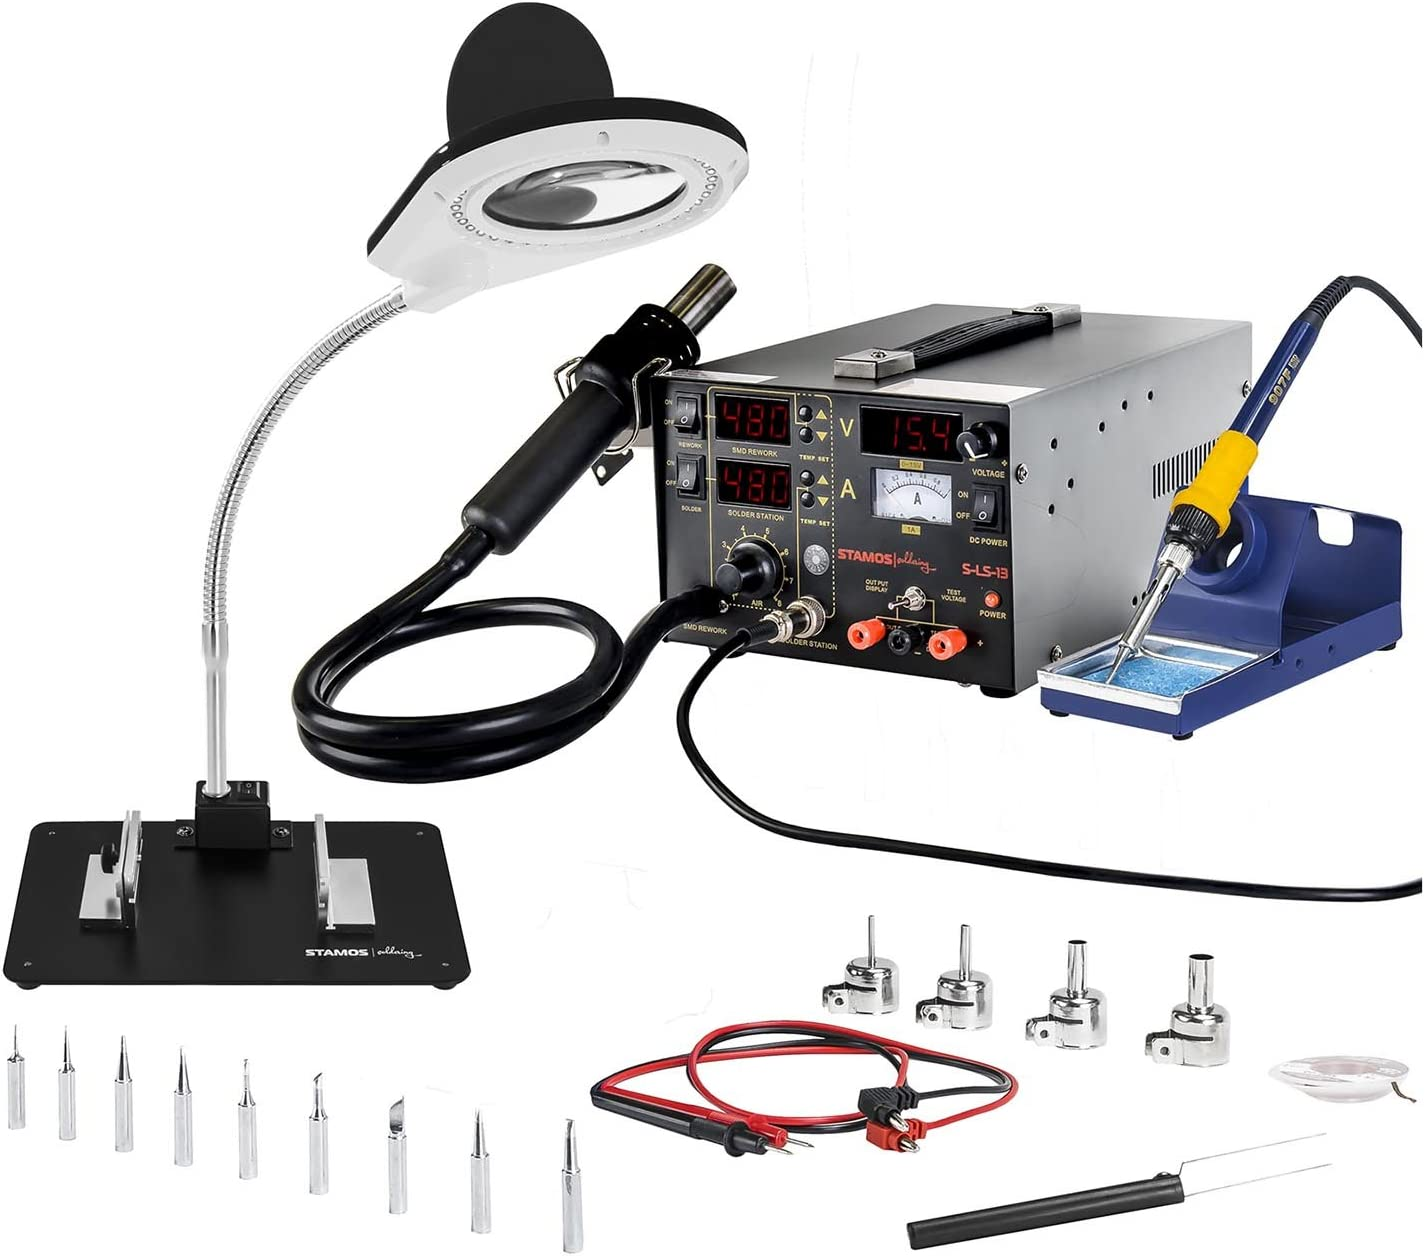 /LED- spedizione gratis Stamos Soldering/ /SMD/ /75/W/ /Stazione di saldatura/ /S-LS-6/Basic/